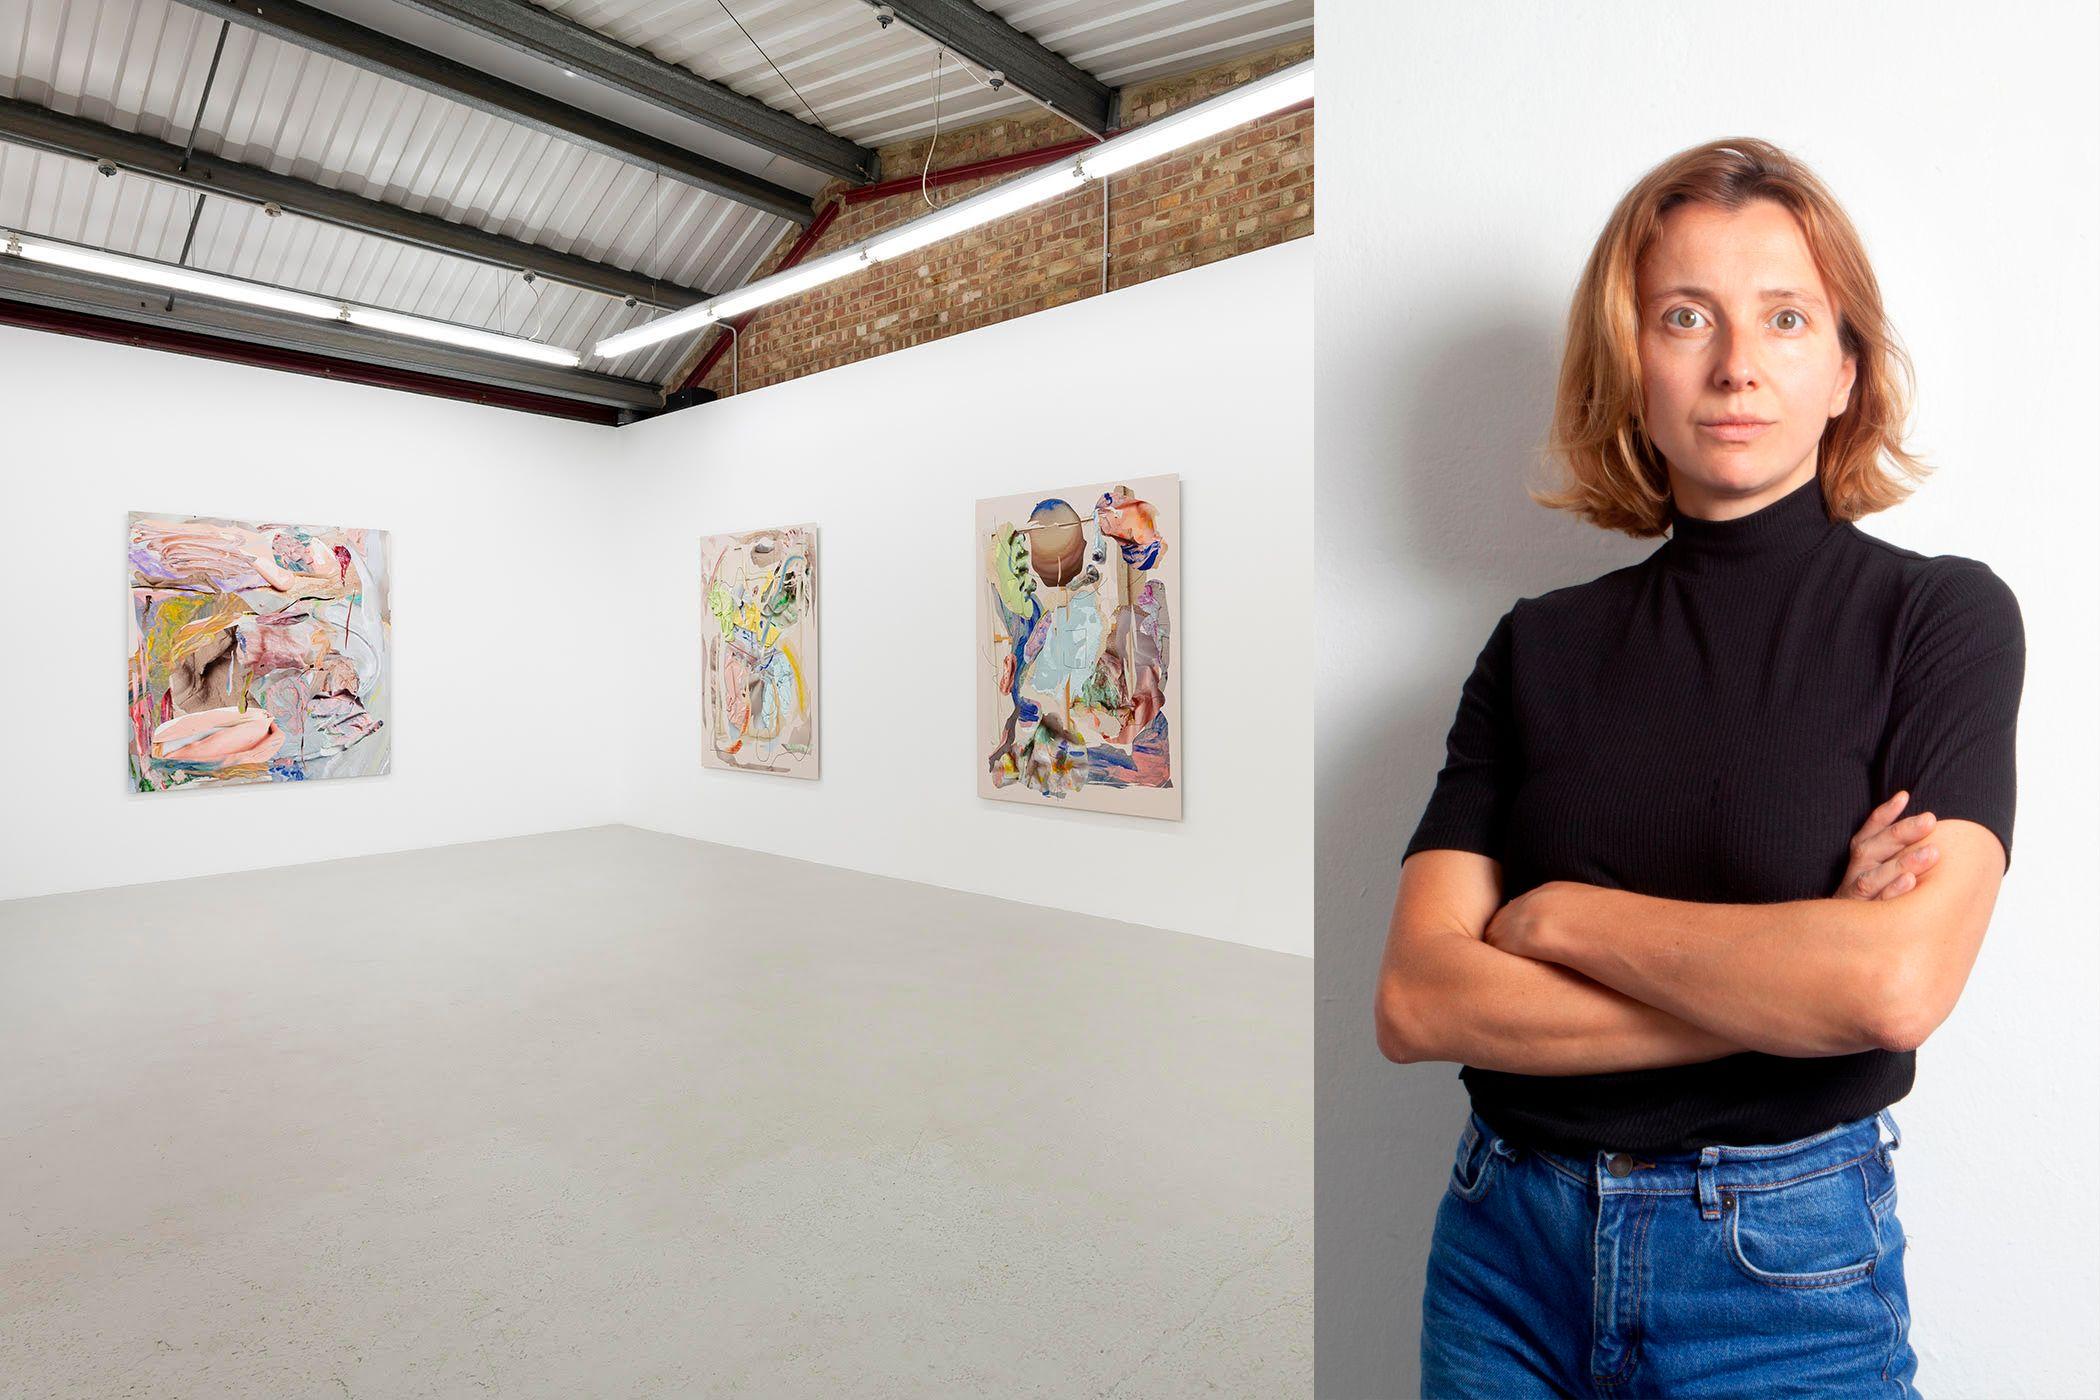 Rachel de Joode's new show Soft has opened at the Annka Kultys Gallery in London